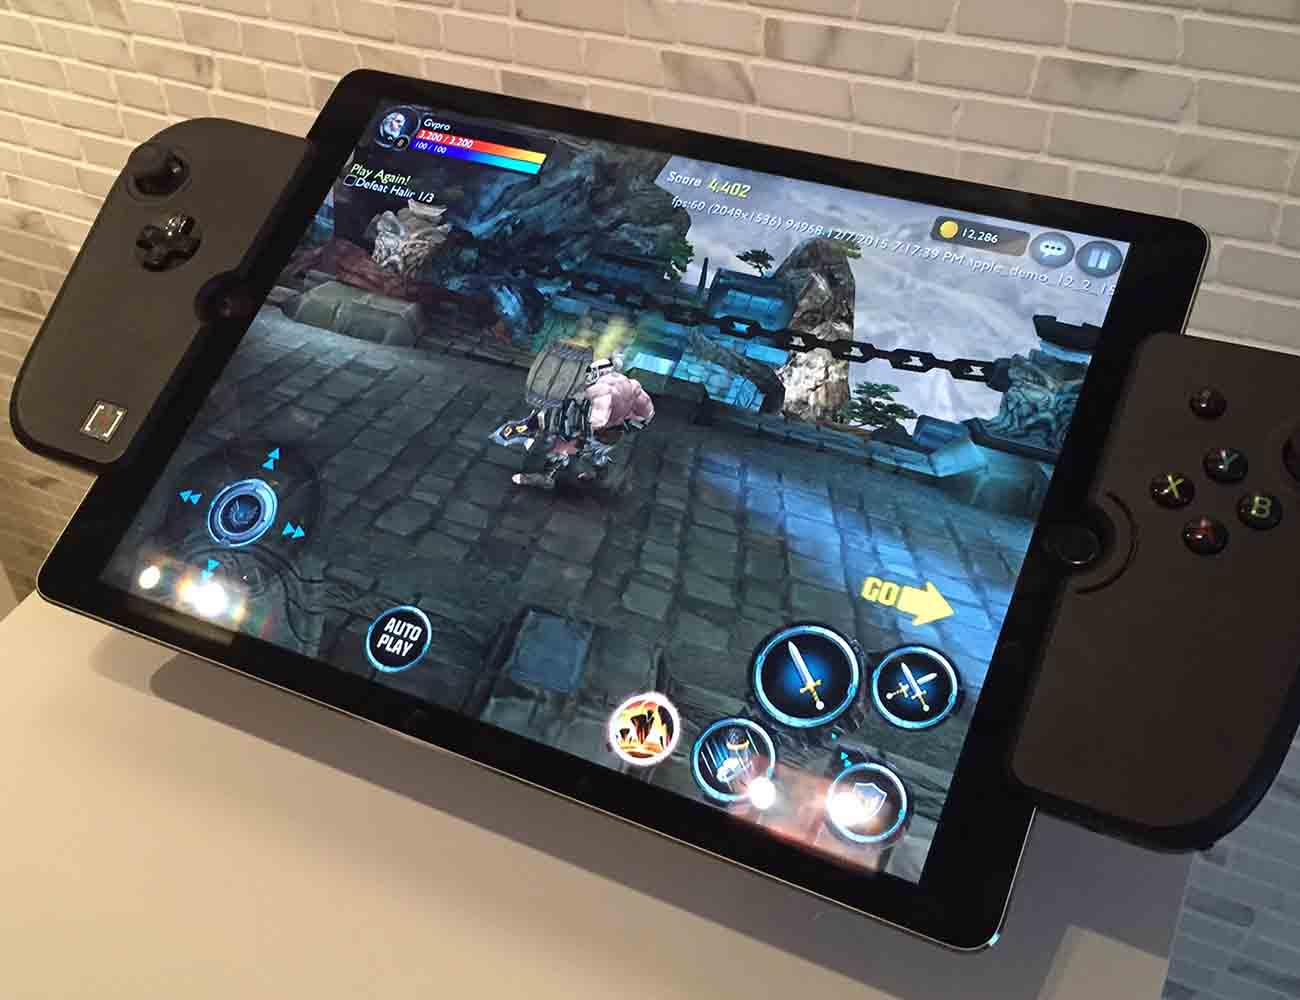 Gamevice+Handheld+Controller+For+IPad+Mini